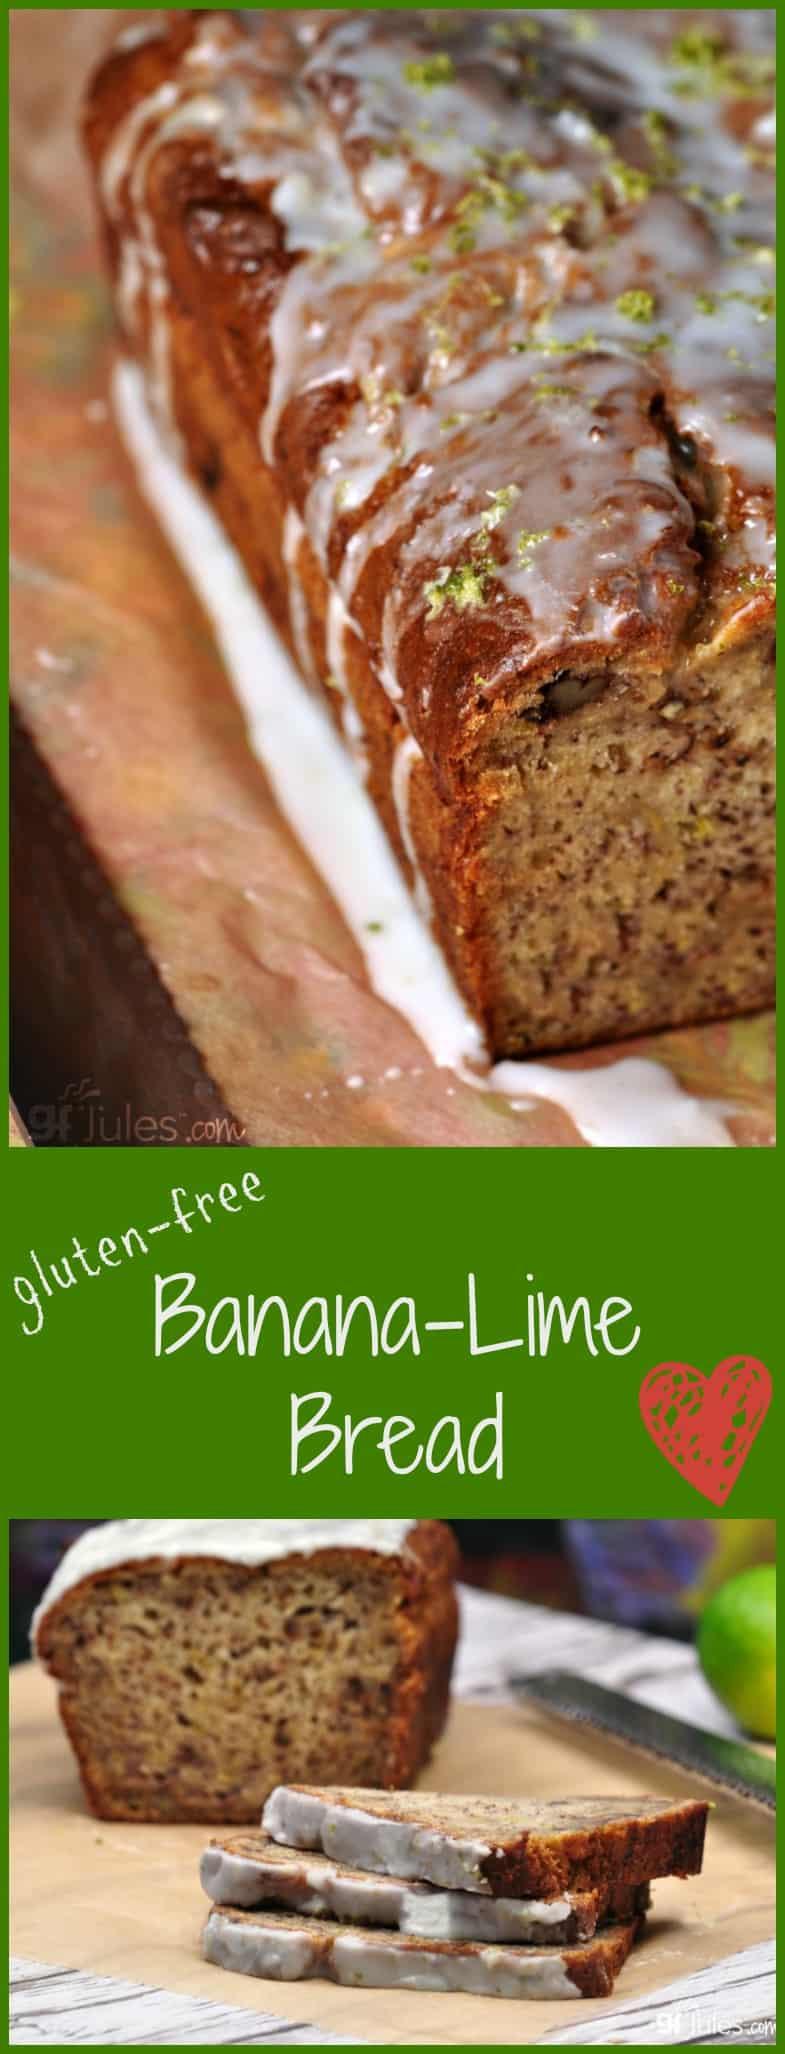 Gluten Dairy Free Banana Bread  Gluten Free Banana Lime Bread Moist & Flavorful gfJules